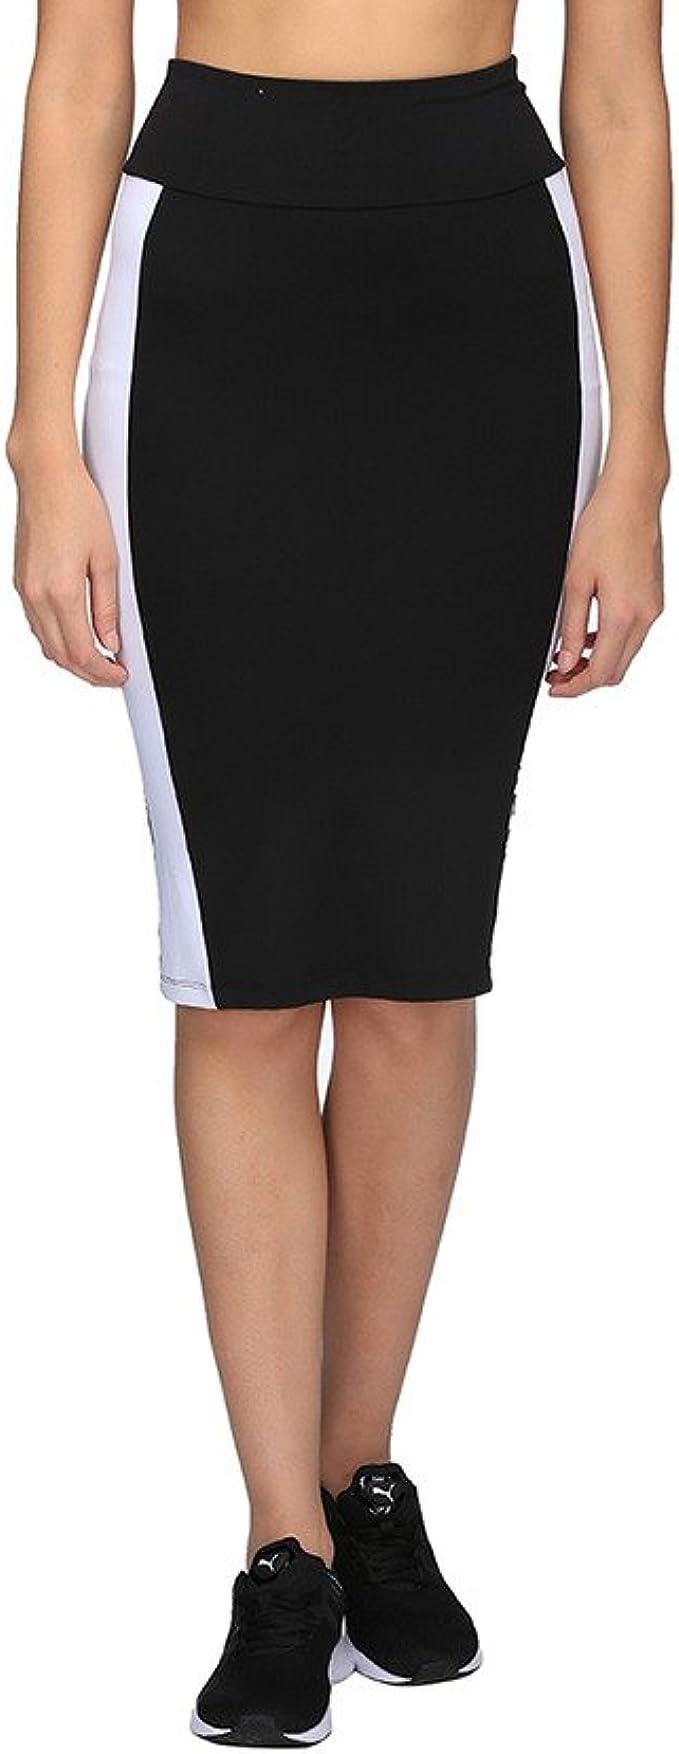 PUMA Archive Logo Pencil Skirt Falda, Mujer: Amazon.es: Ropa y ...